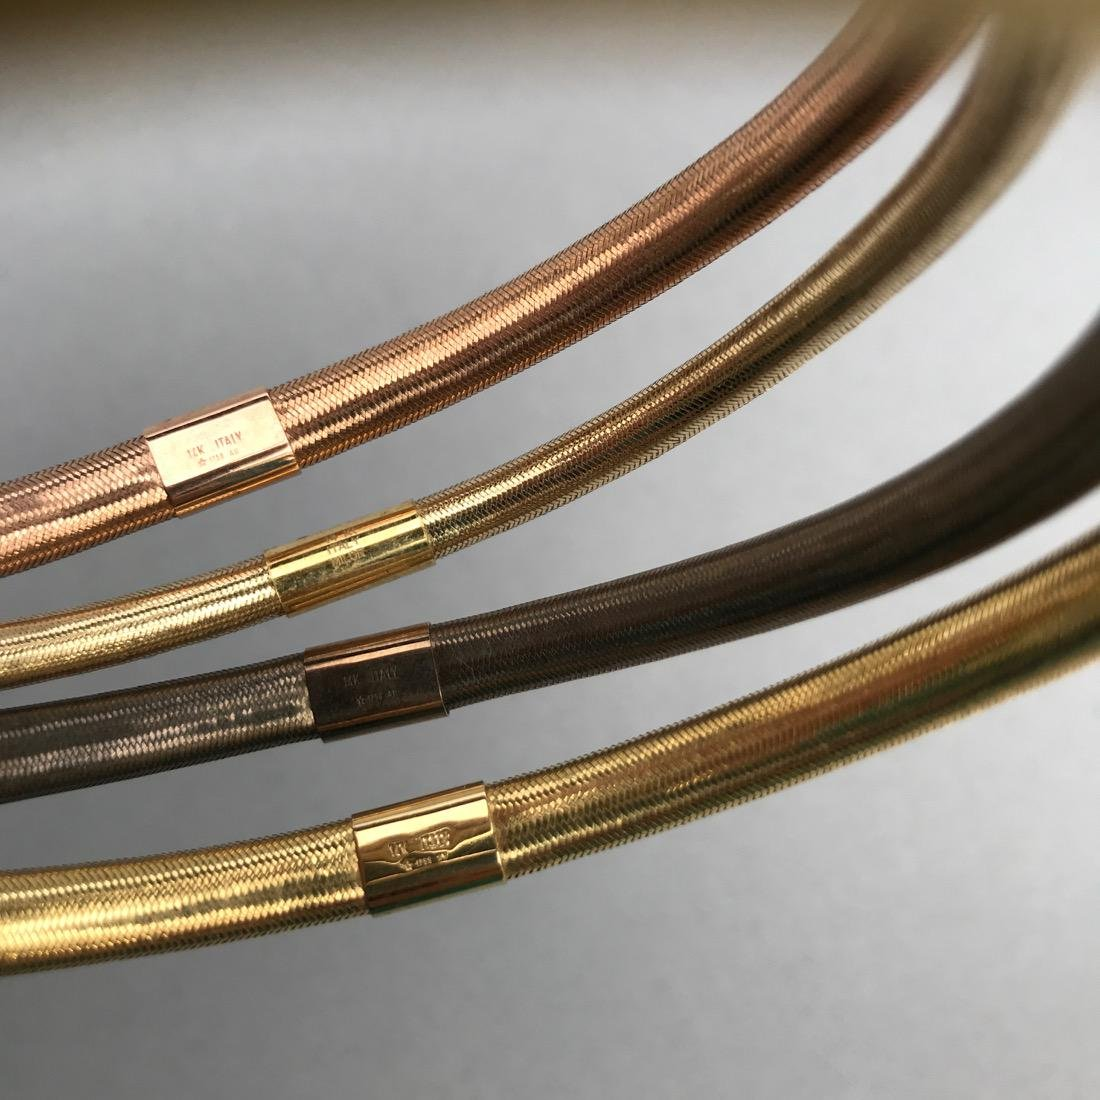 4 14K Gold Woven Flexible Bangle Bracelets - 3